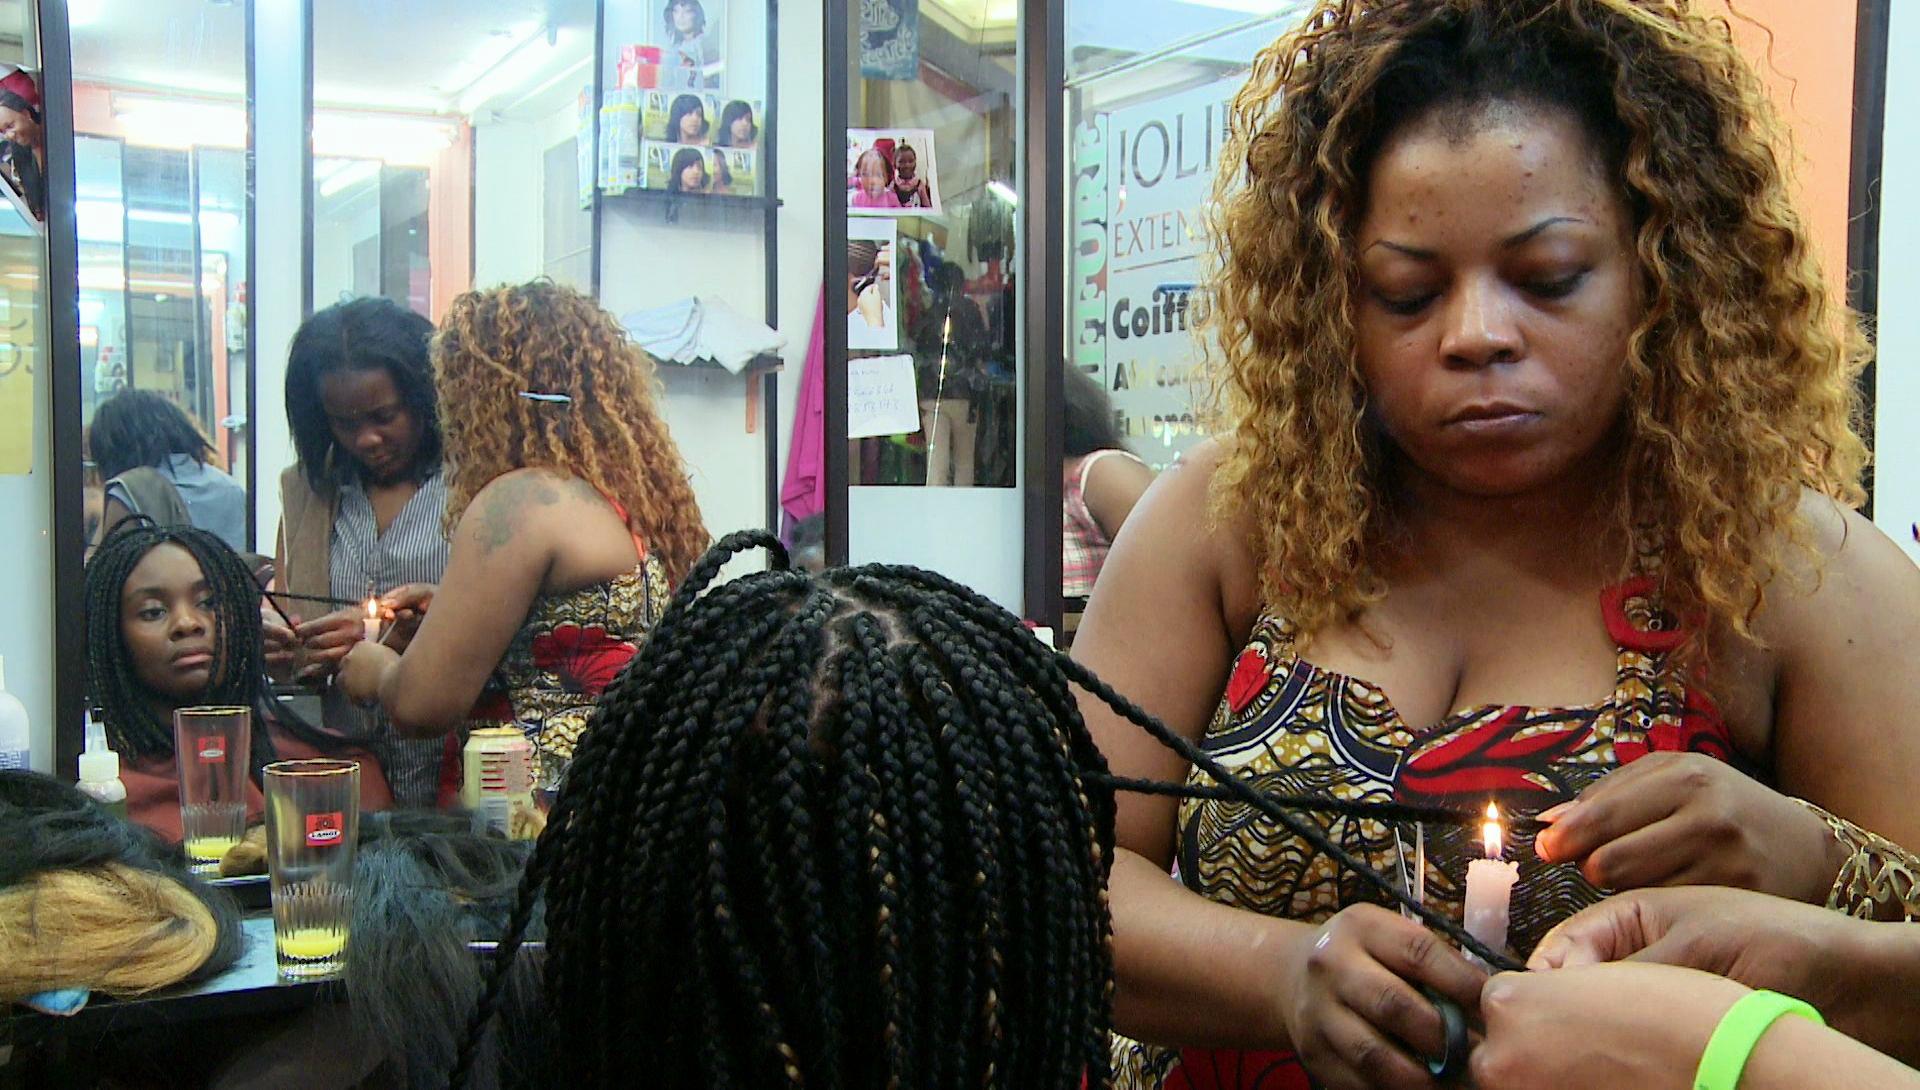 Femme Cherche Homme Pour Relation Sérieuse à Bogota Dessou Sexi